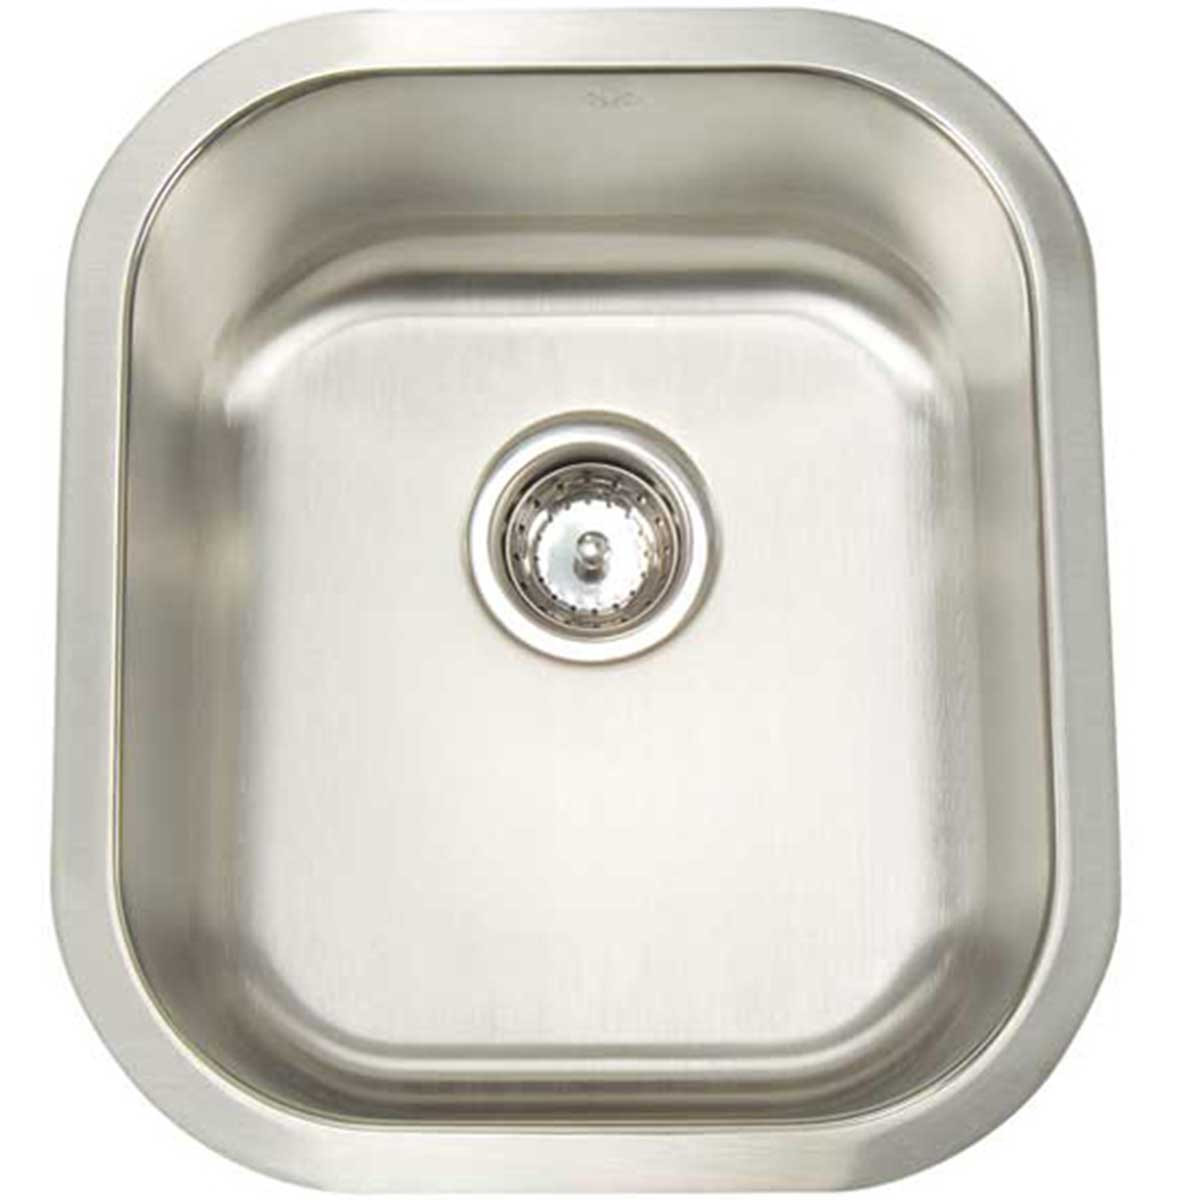 Artisan Sinks 16 Gauge AR1618-D8